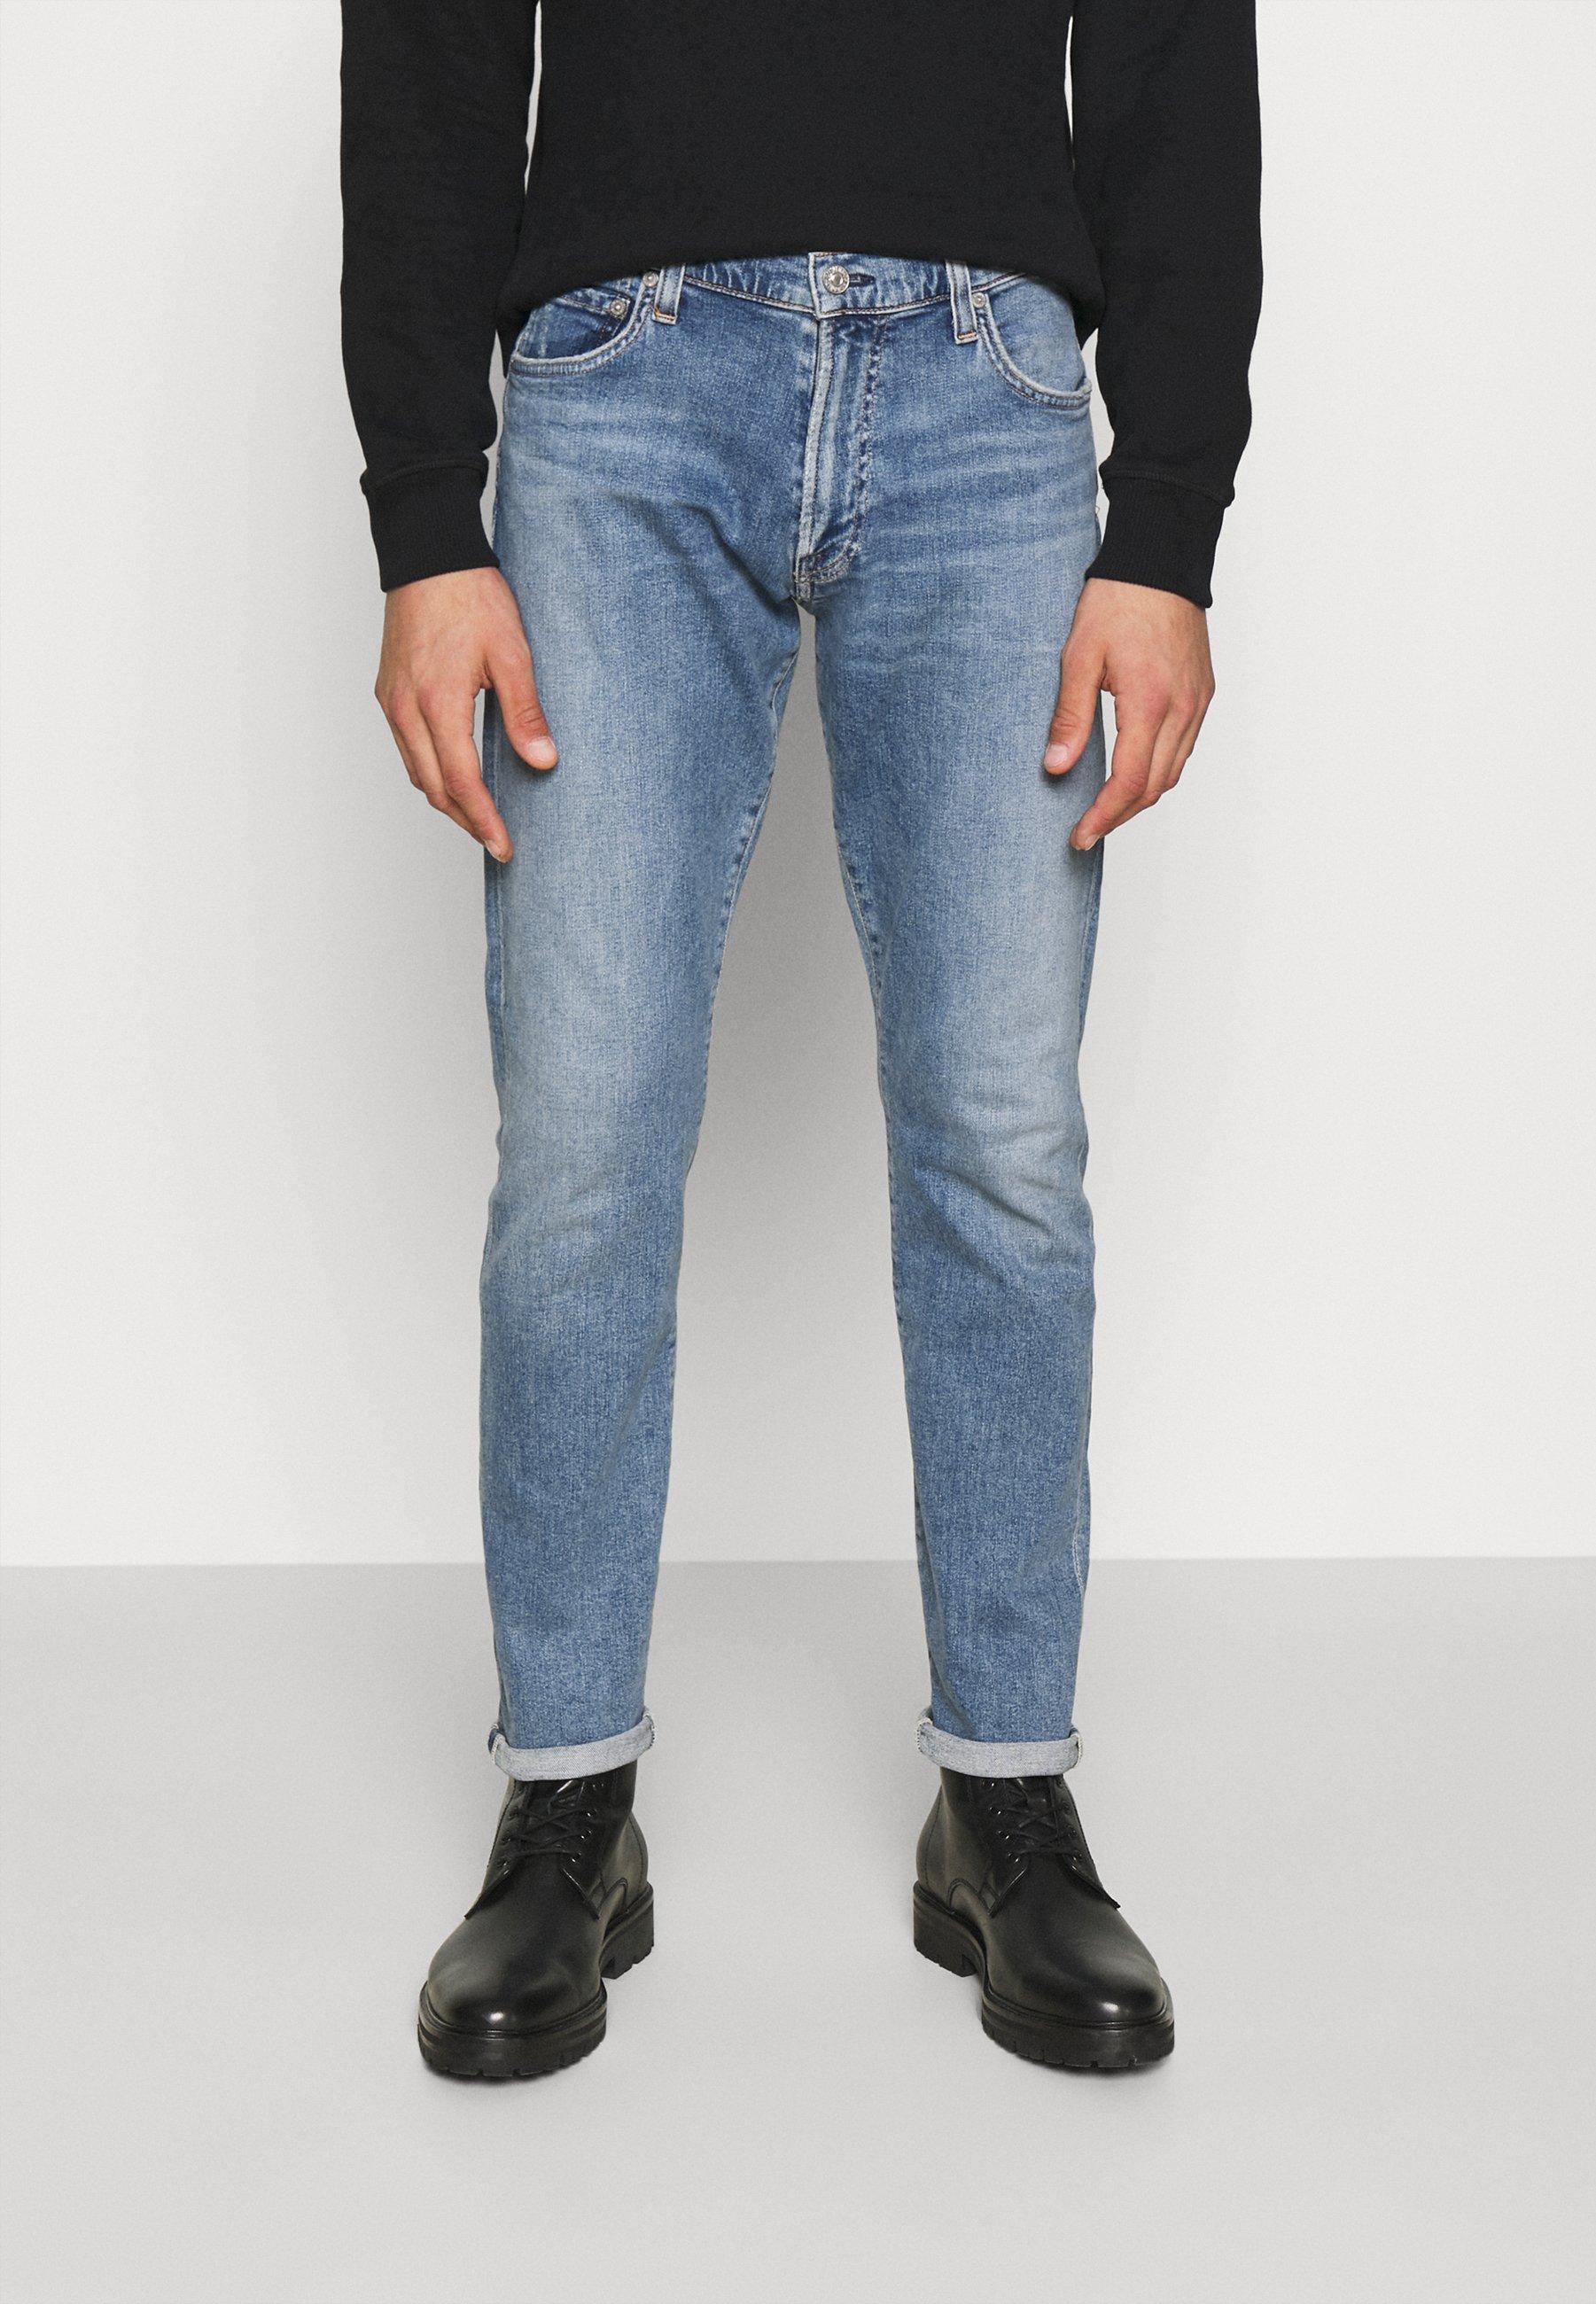 Uomo JAQUIN - Jeans slim fit